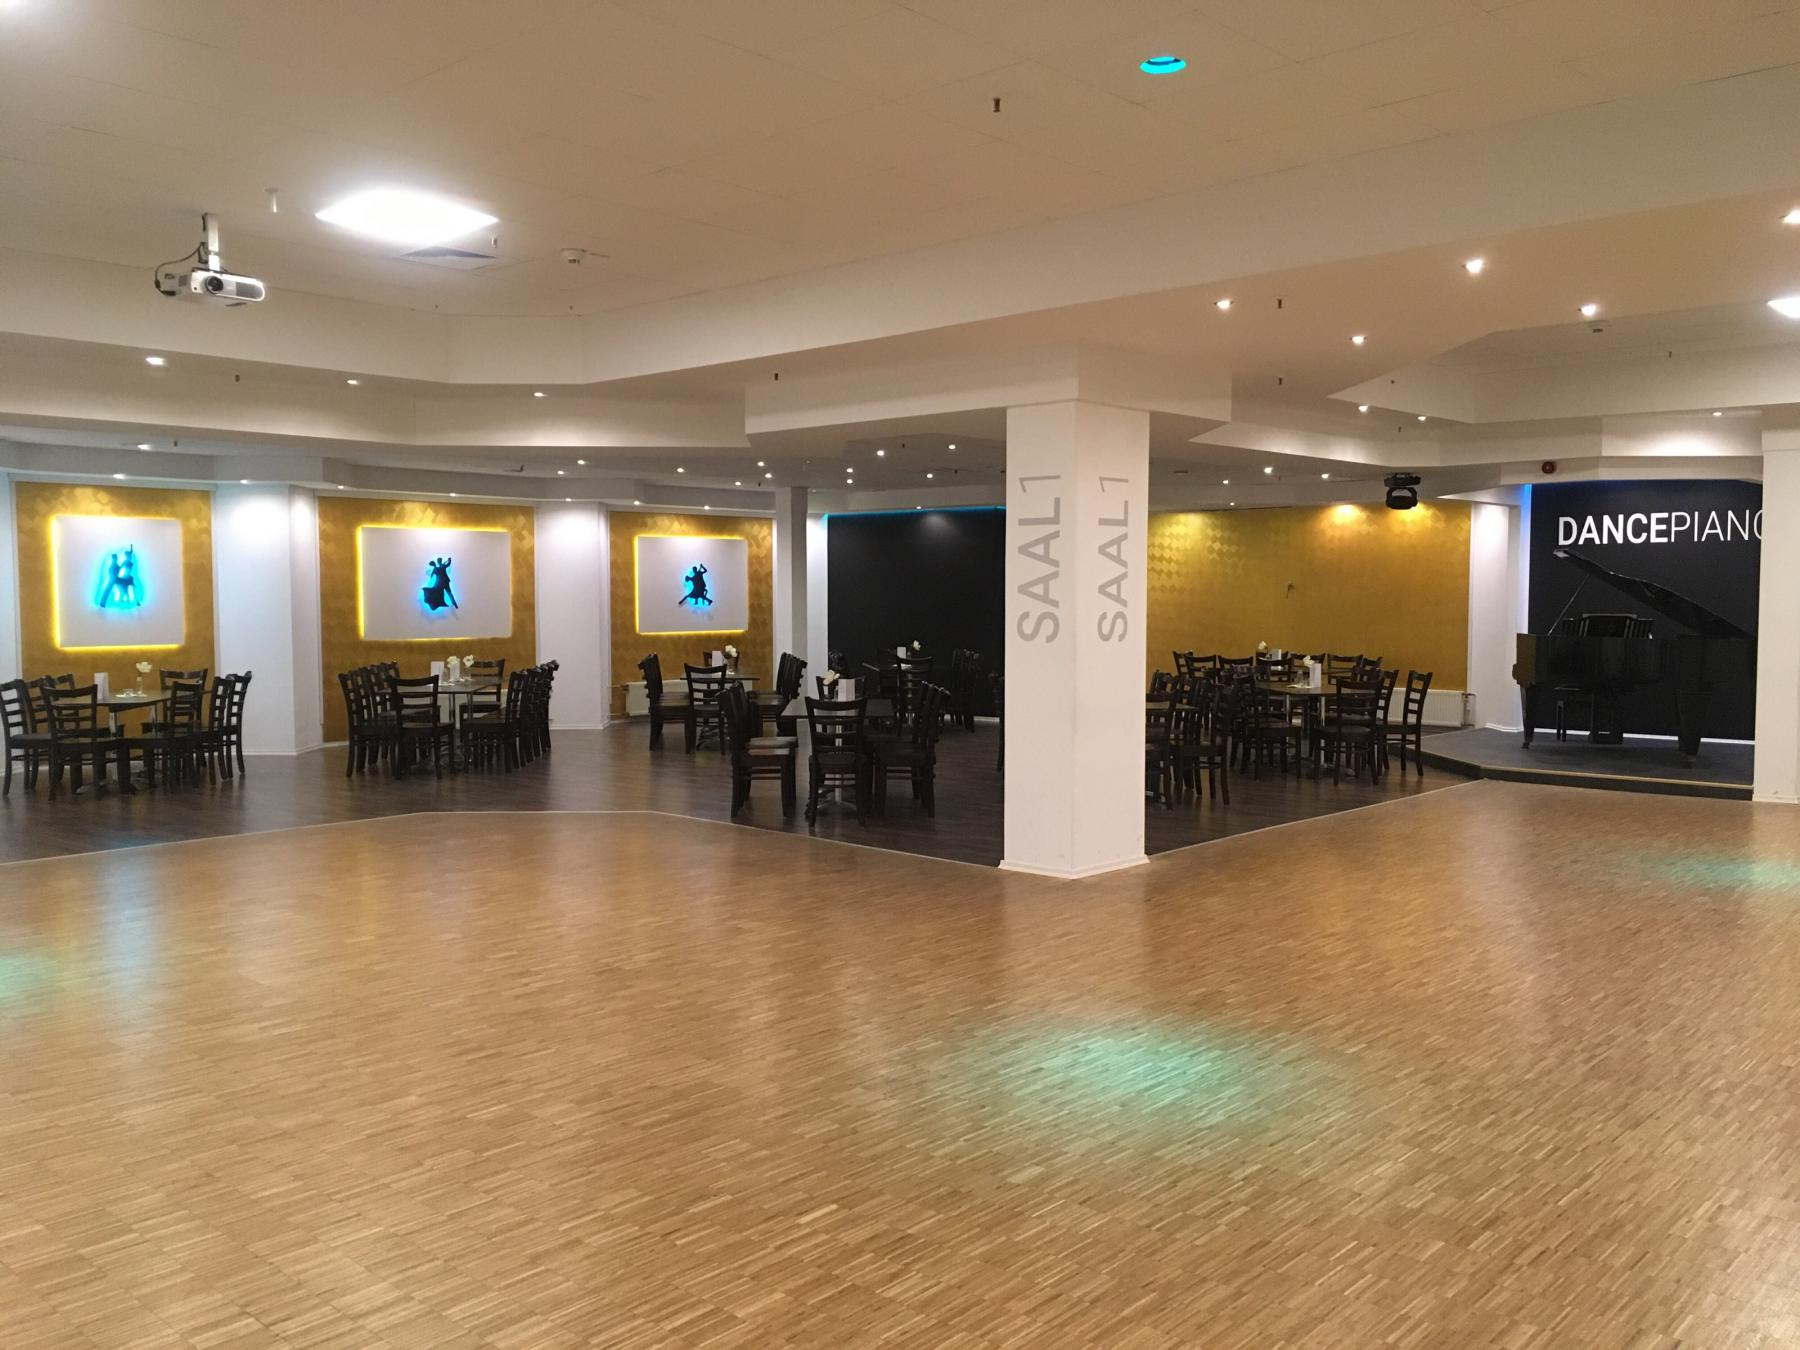 produkte von danceimperial gmbh tanzschule in regensburg. Black Bedroom Furniture Sets. Home Design Ideas